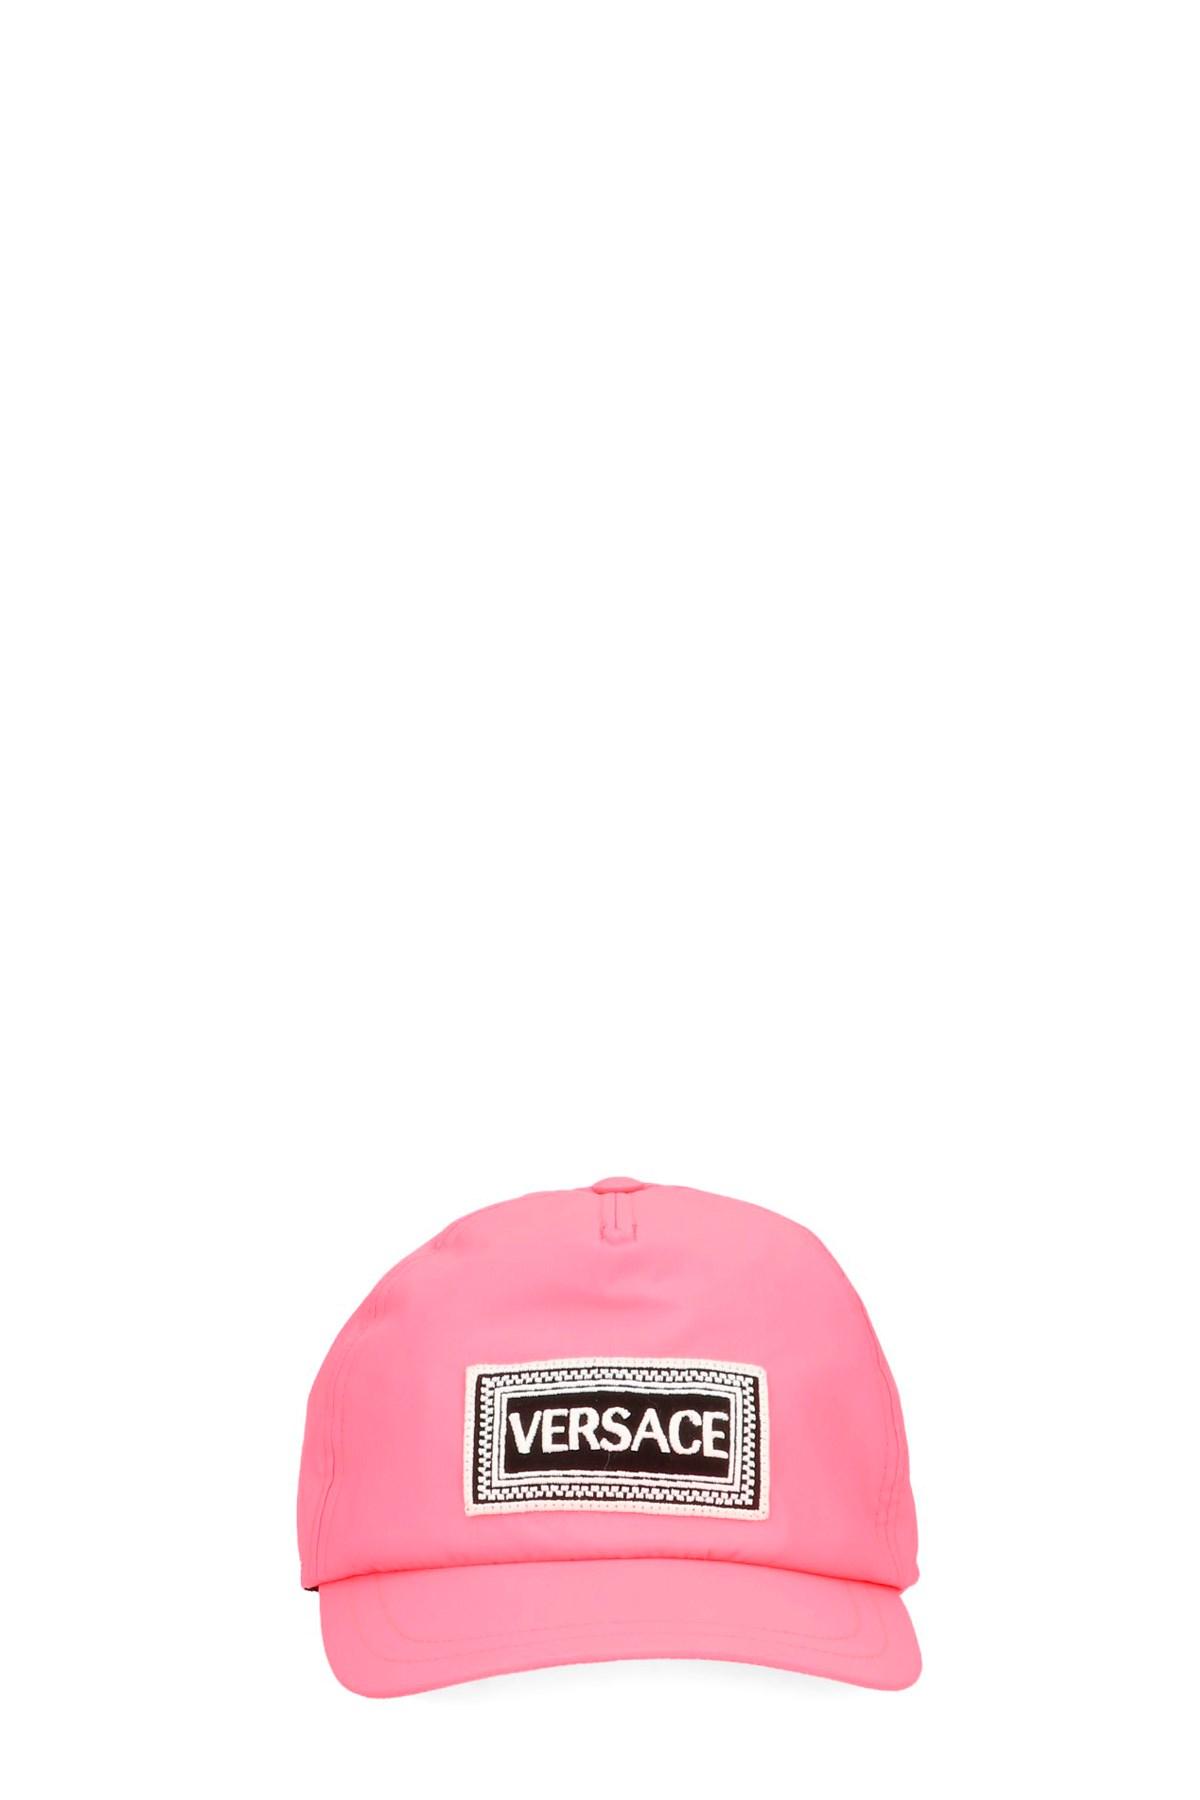 b61f7c500d664 young versace logo cap available on julian-fashion.com - 68976